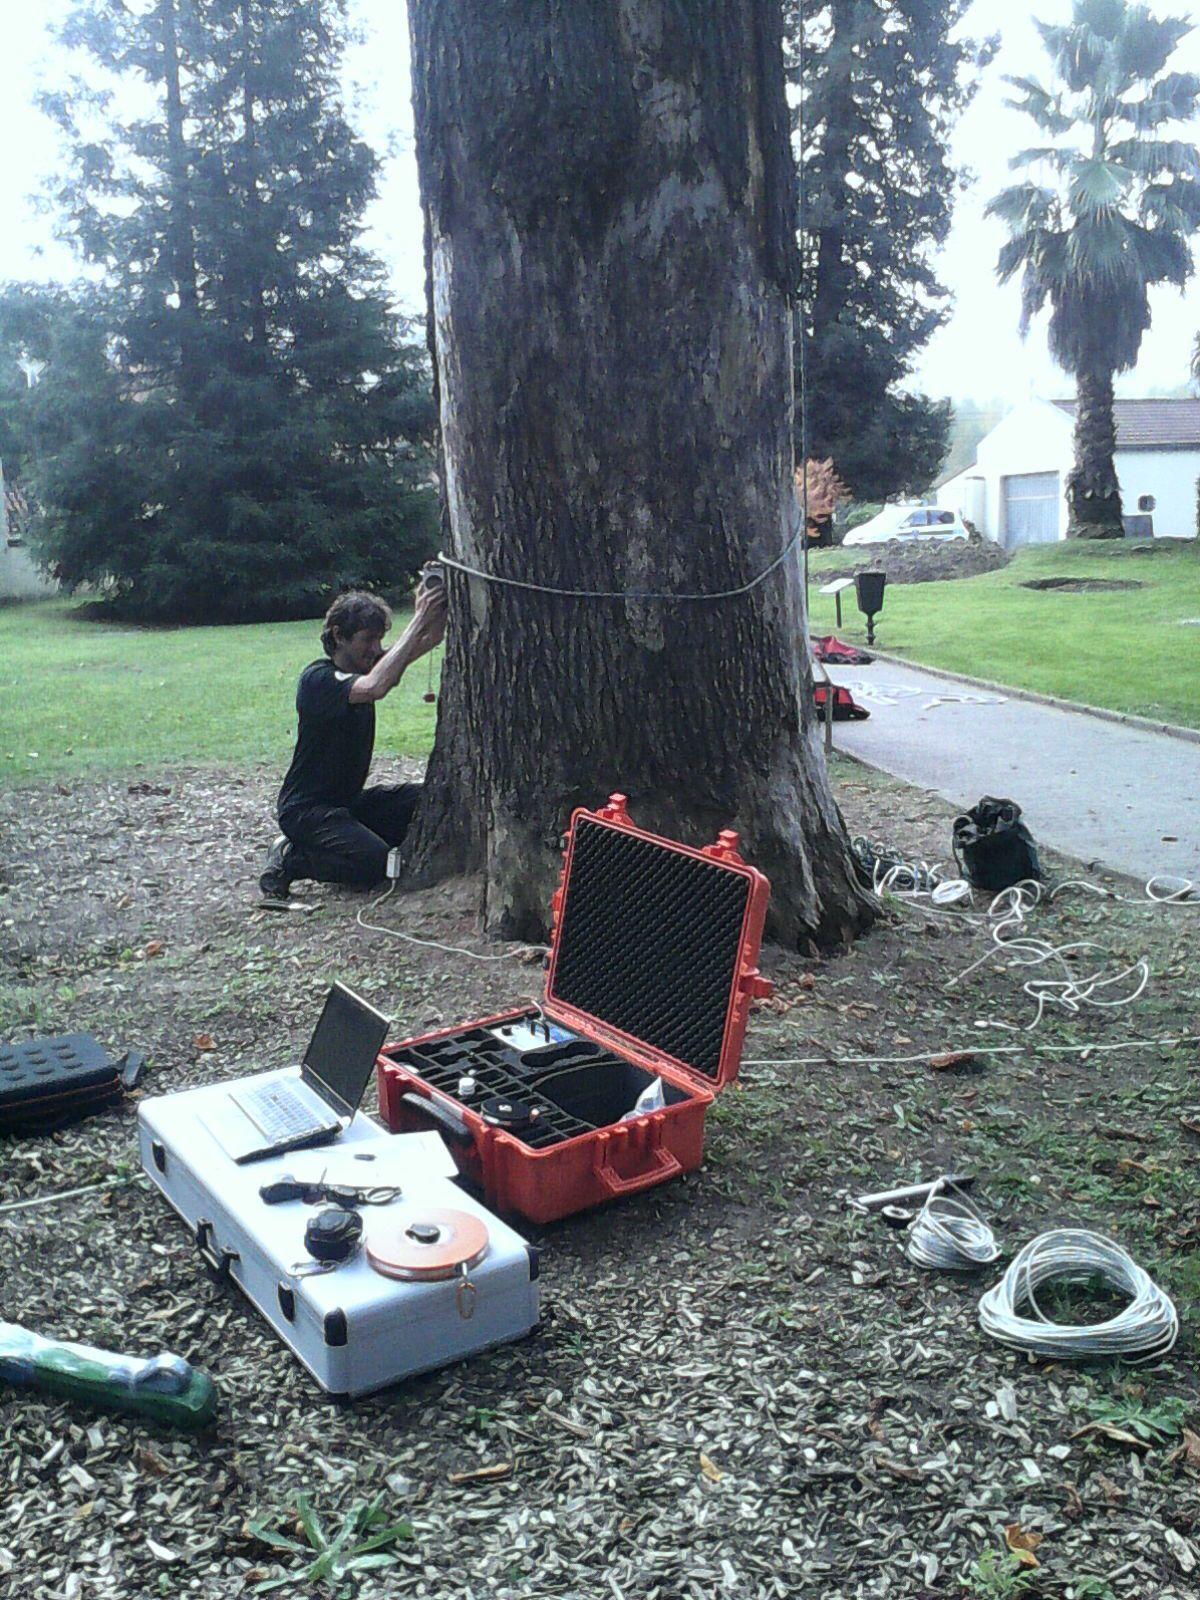 análisis de riesgo árboles